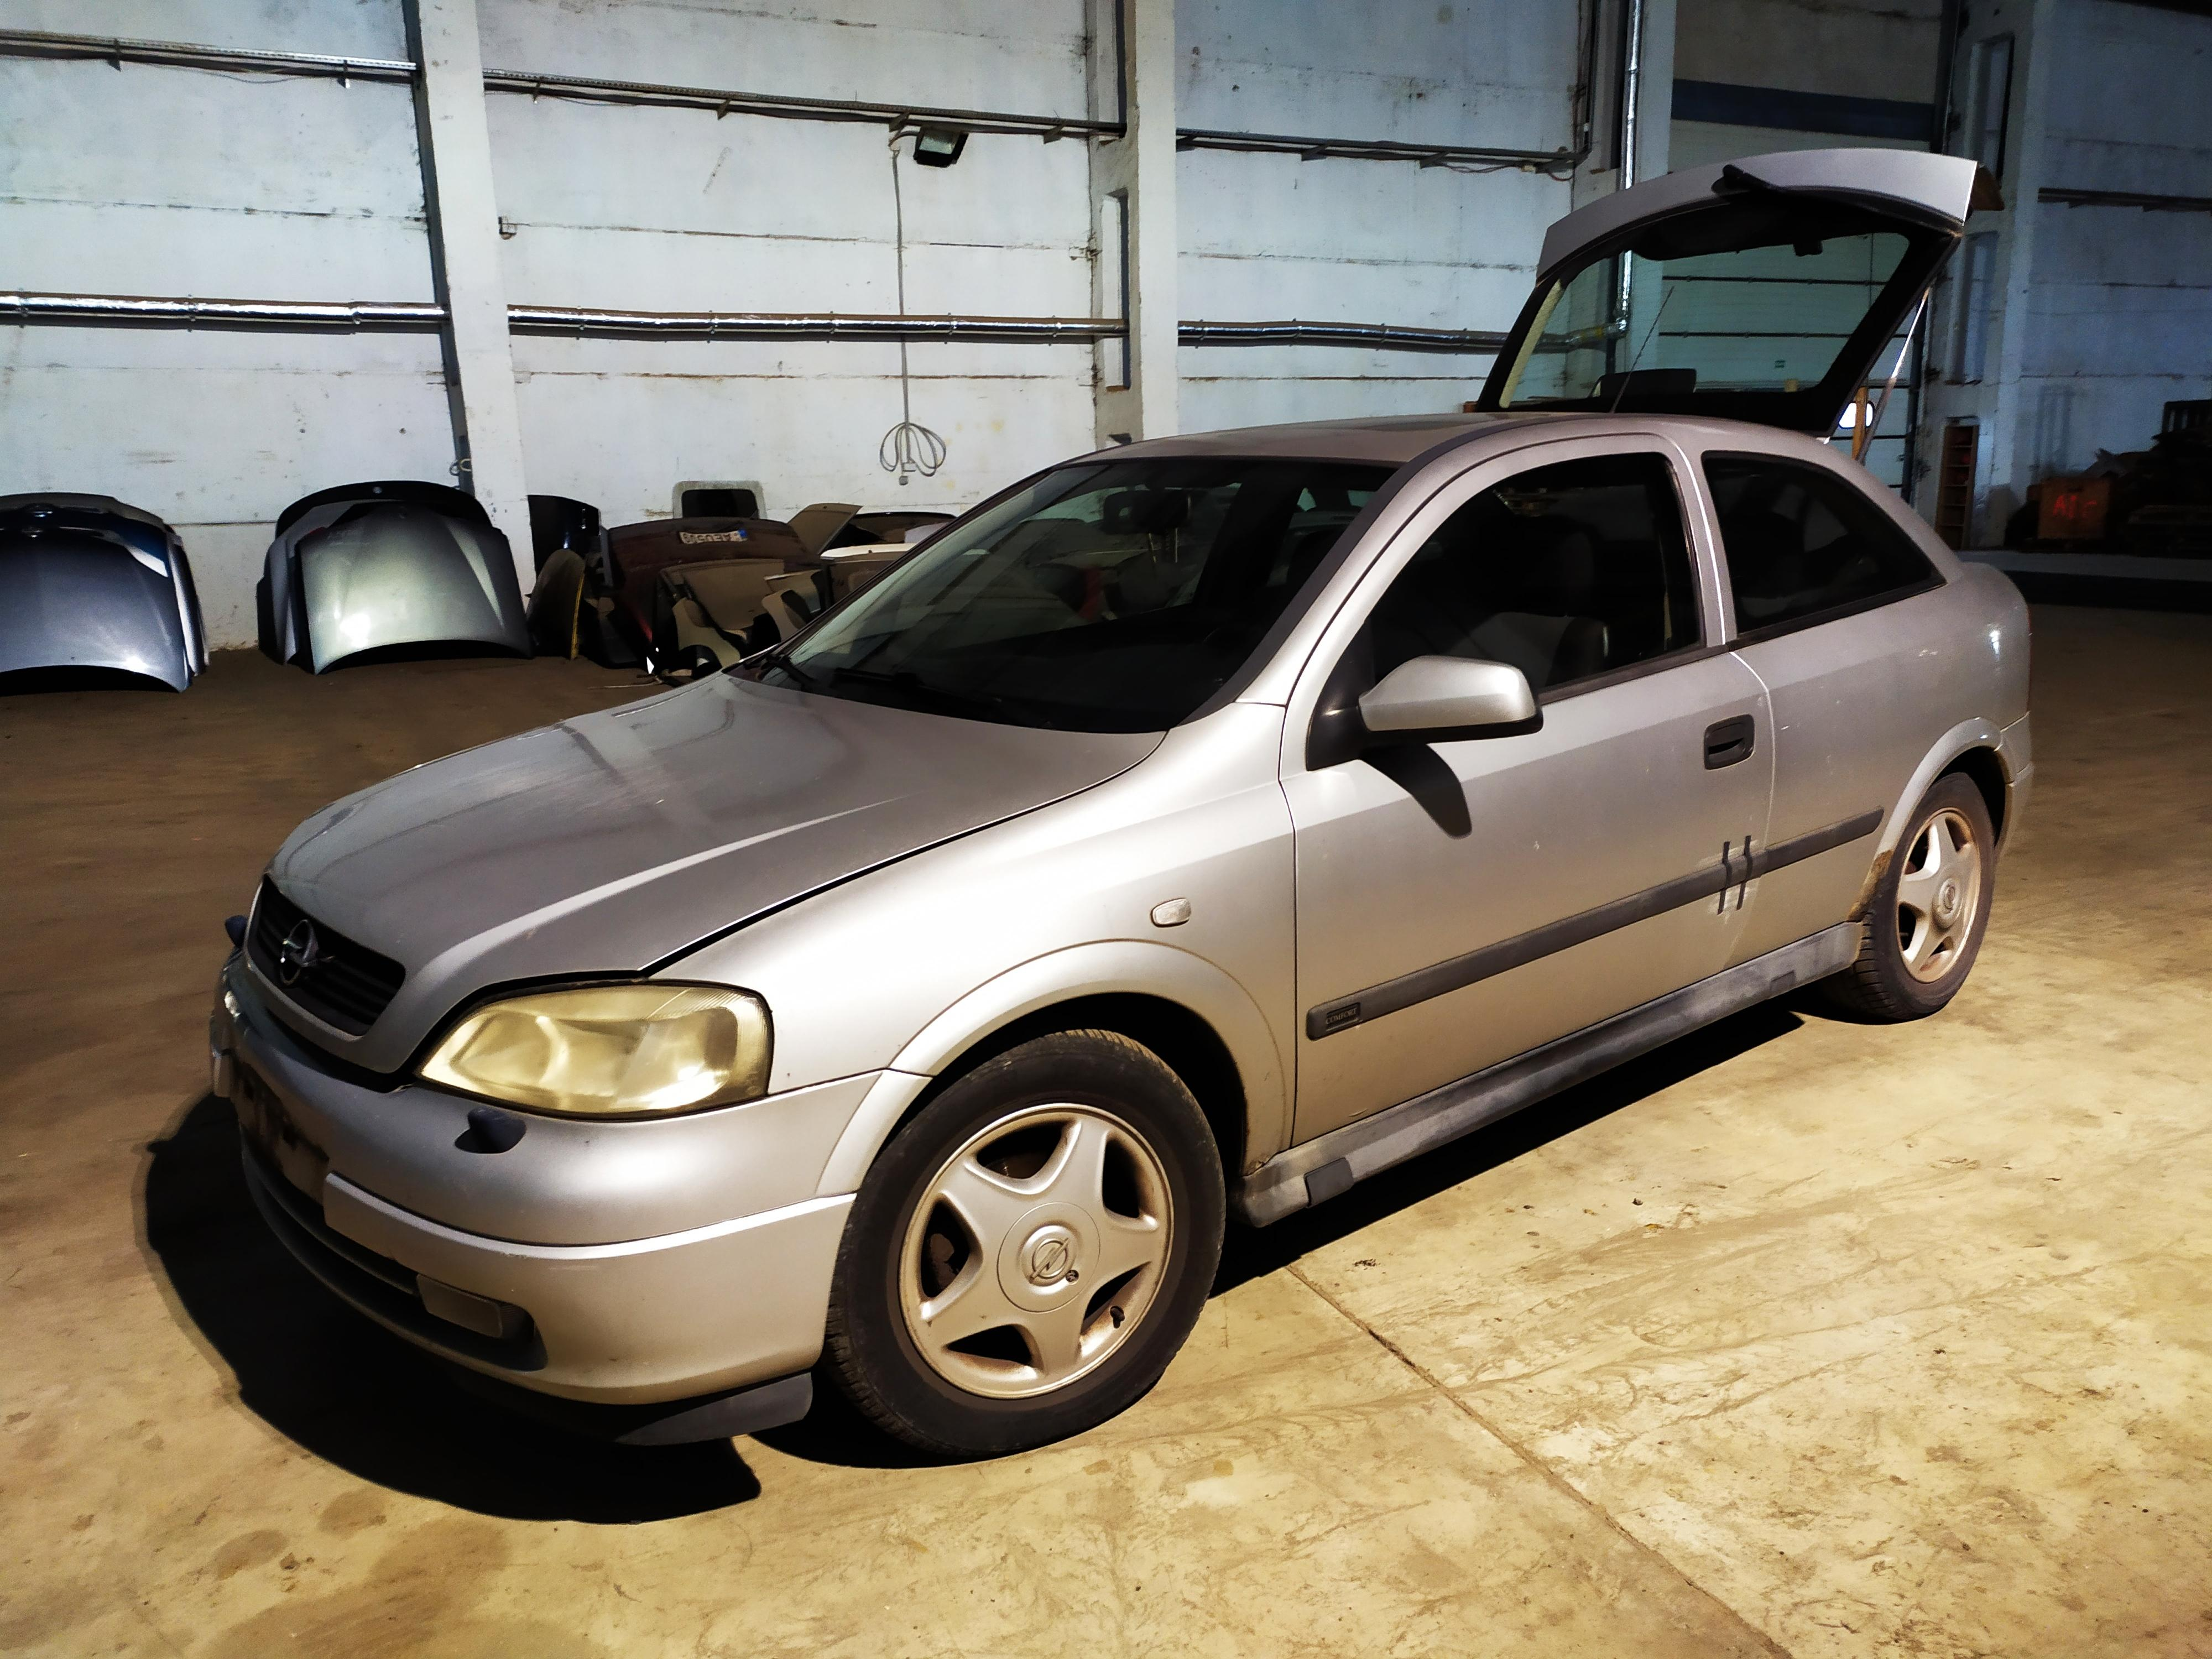 Foto-4 Opel Astra Astra, G 1998.09 - 2004.12 1998 Benzinas 1.6